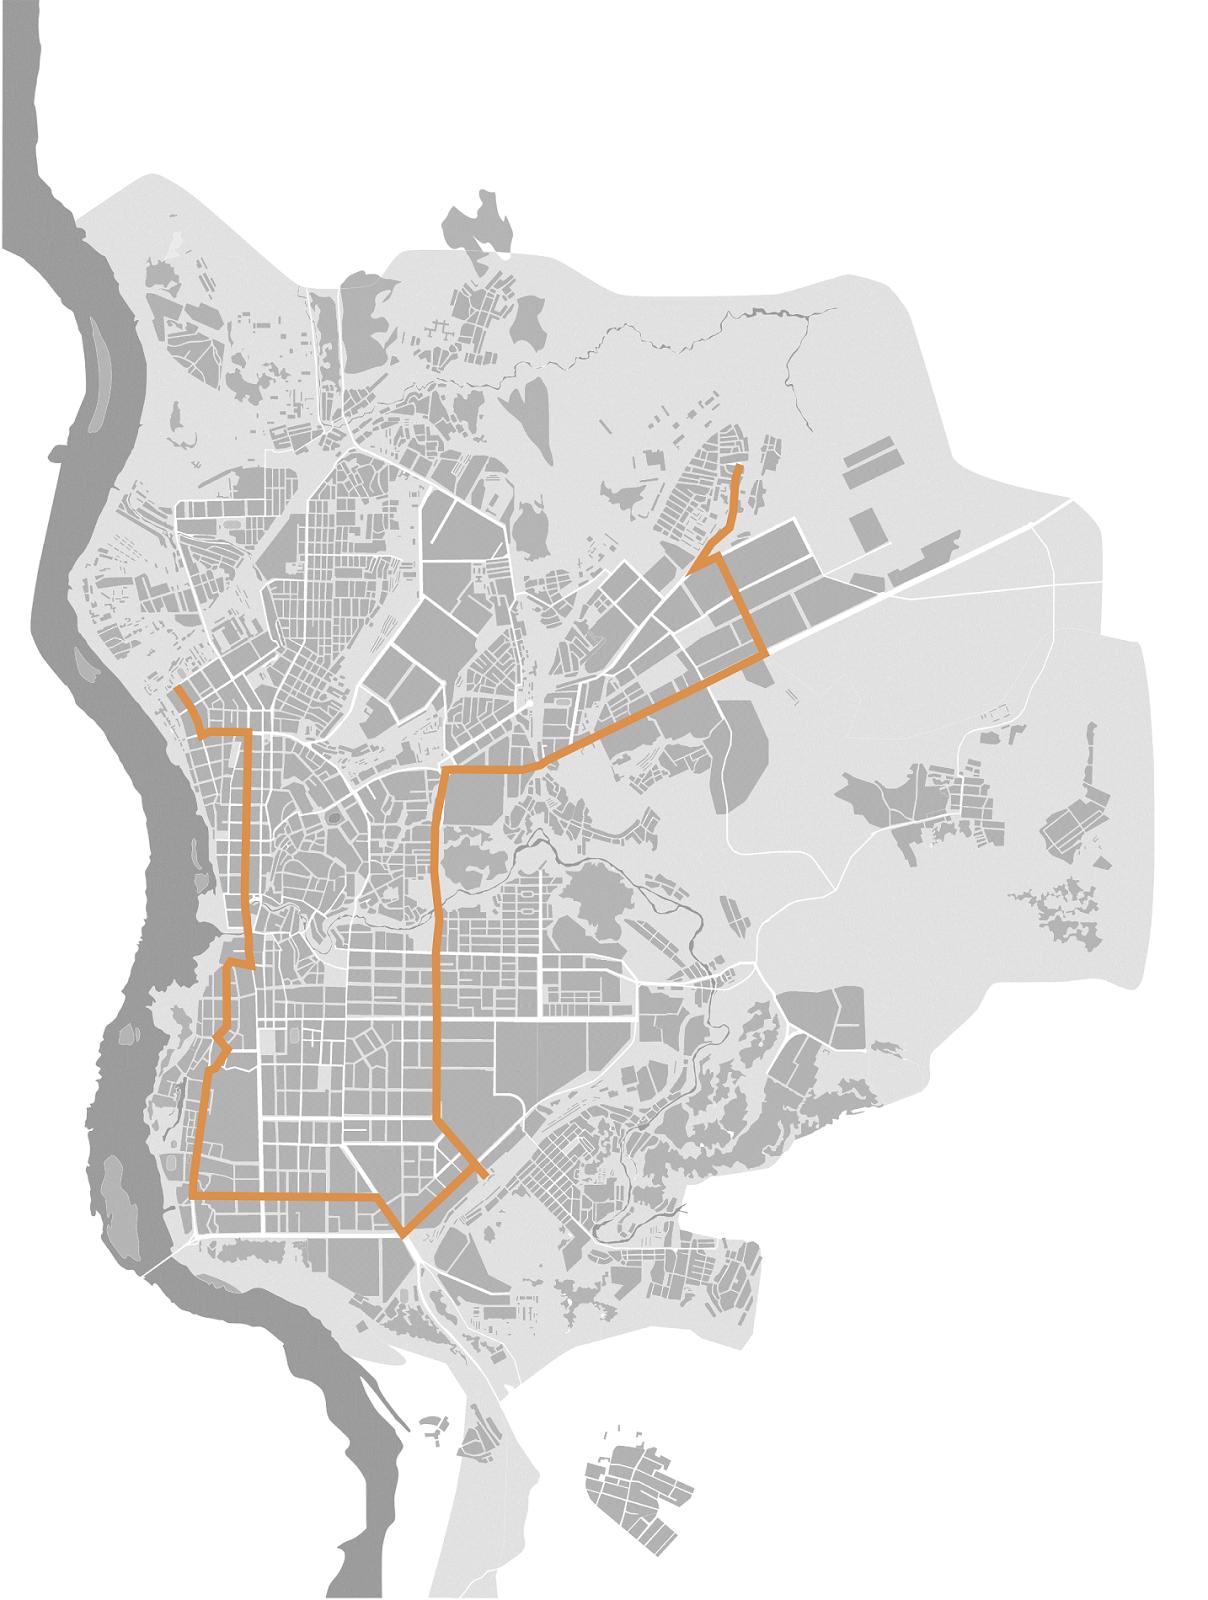 схема поездки 43 маршрутки